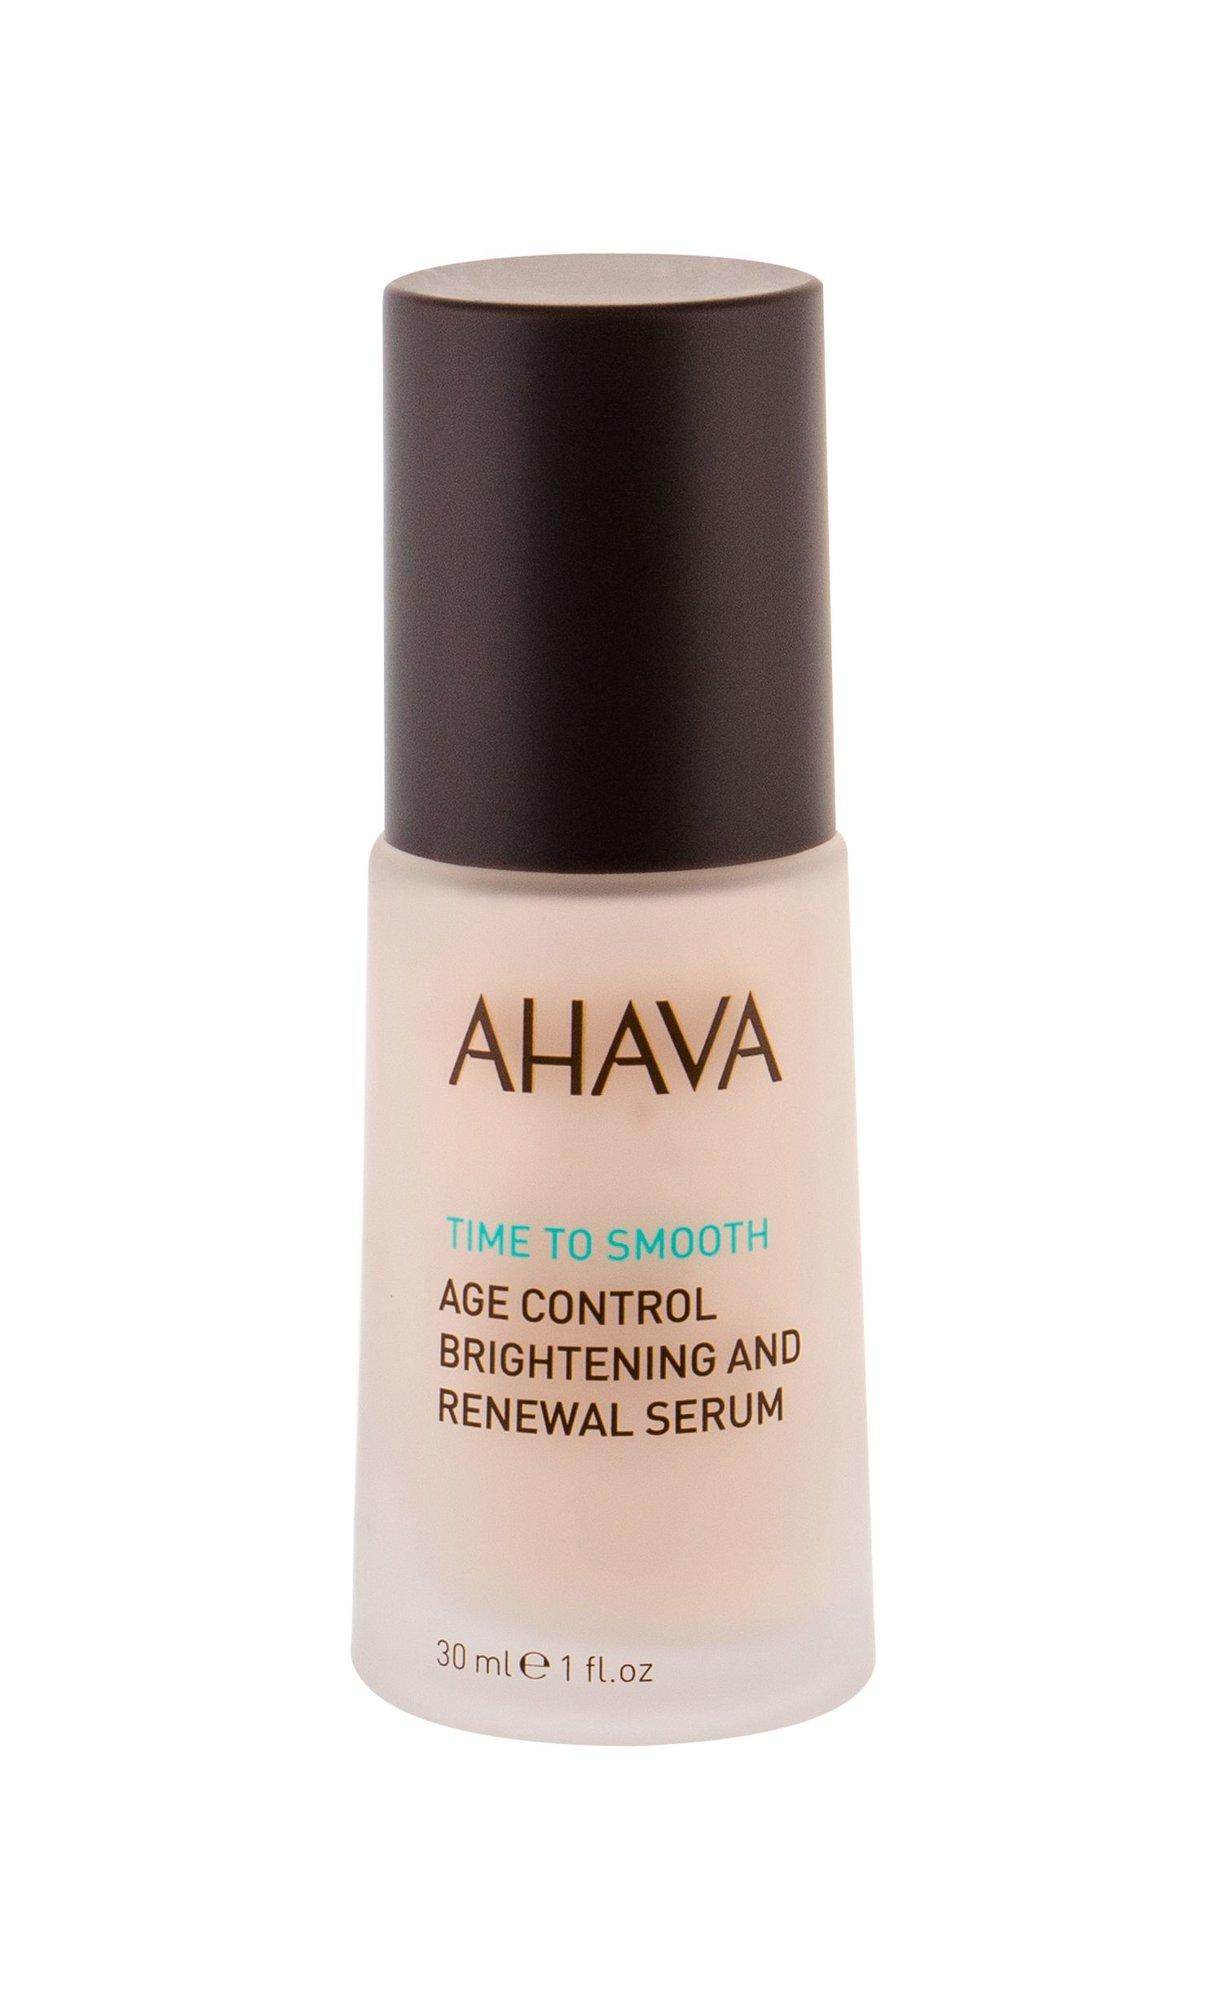 AHAVA Age Control Skin Serum 30ml